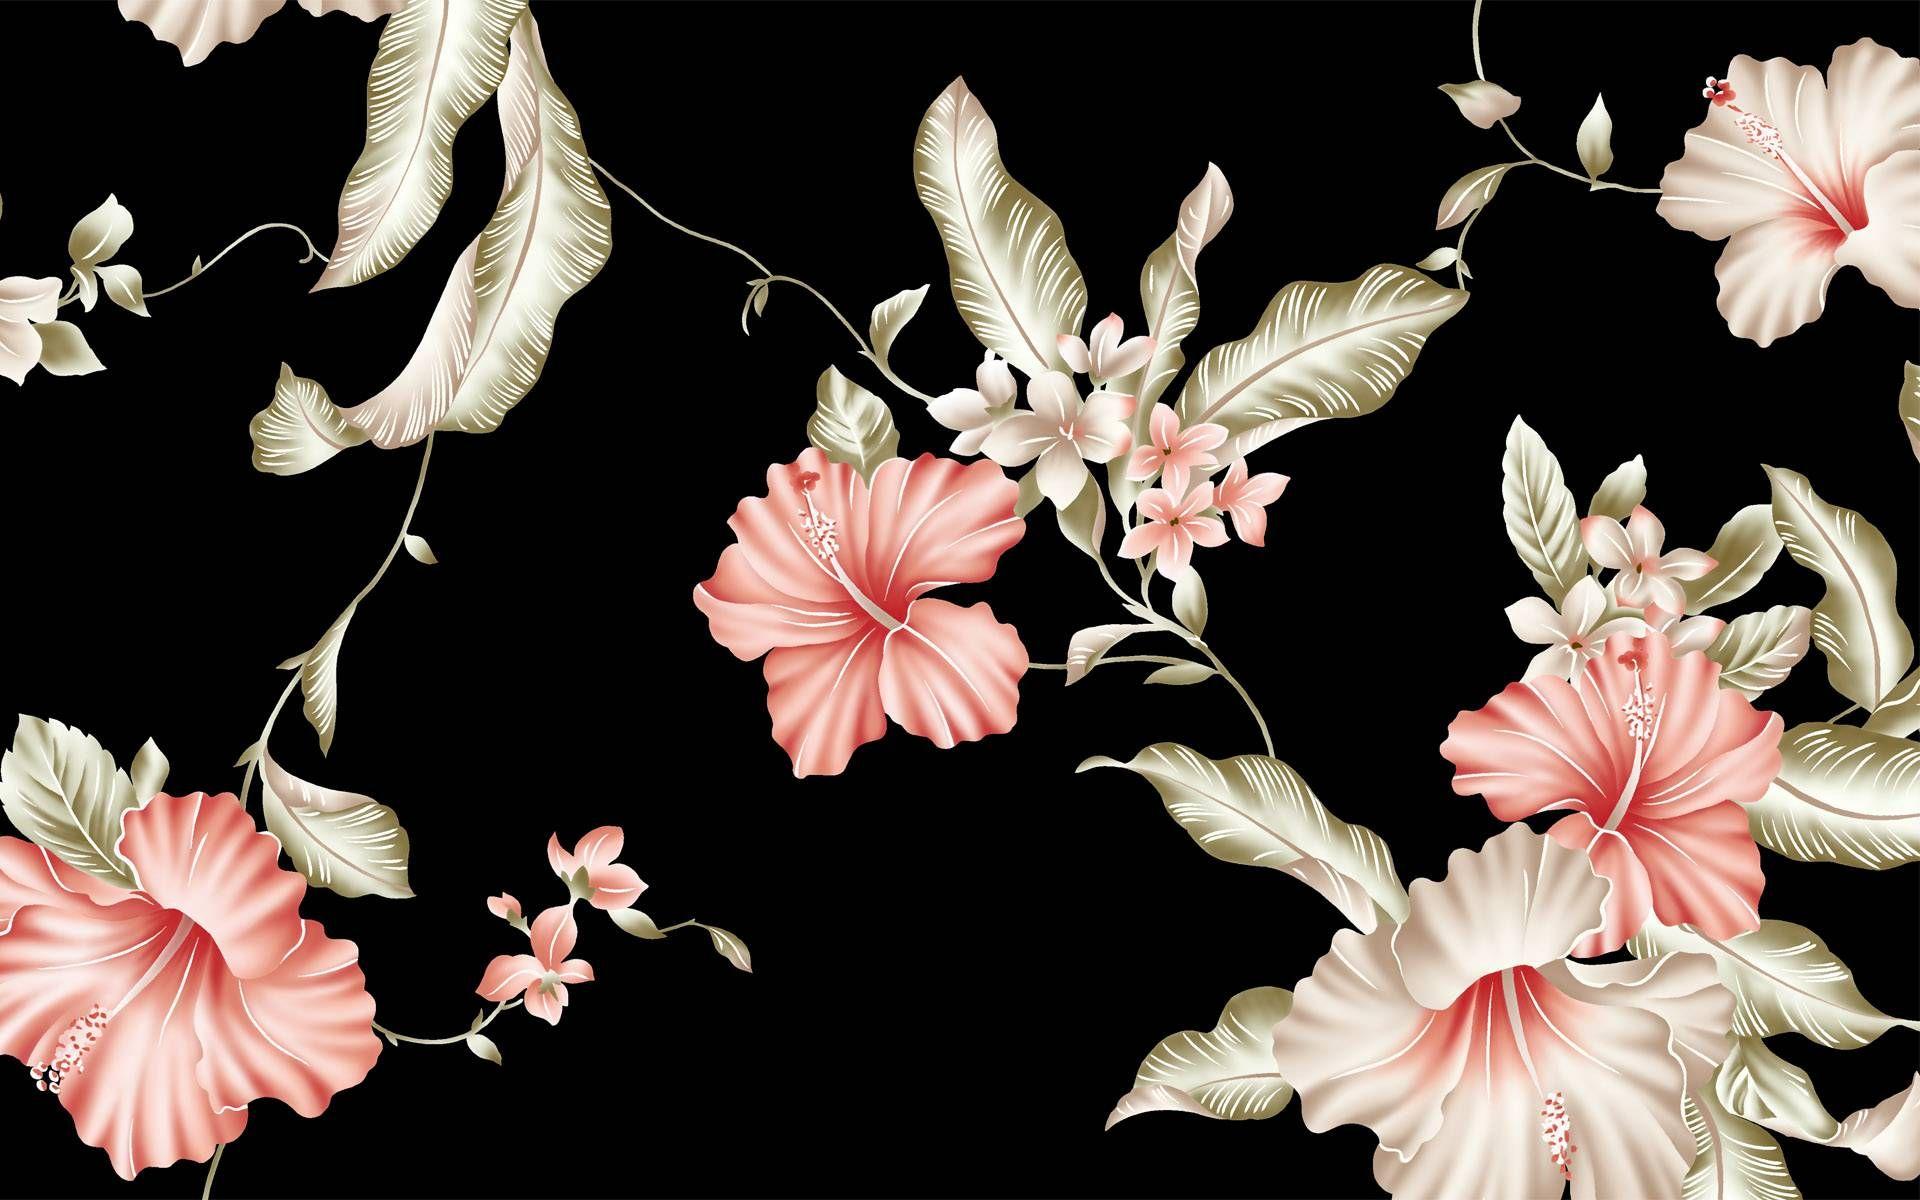 Digital Flowers - Free Desktop Backgrounds With Art, Digital, Flower,